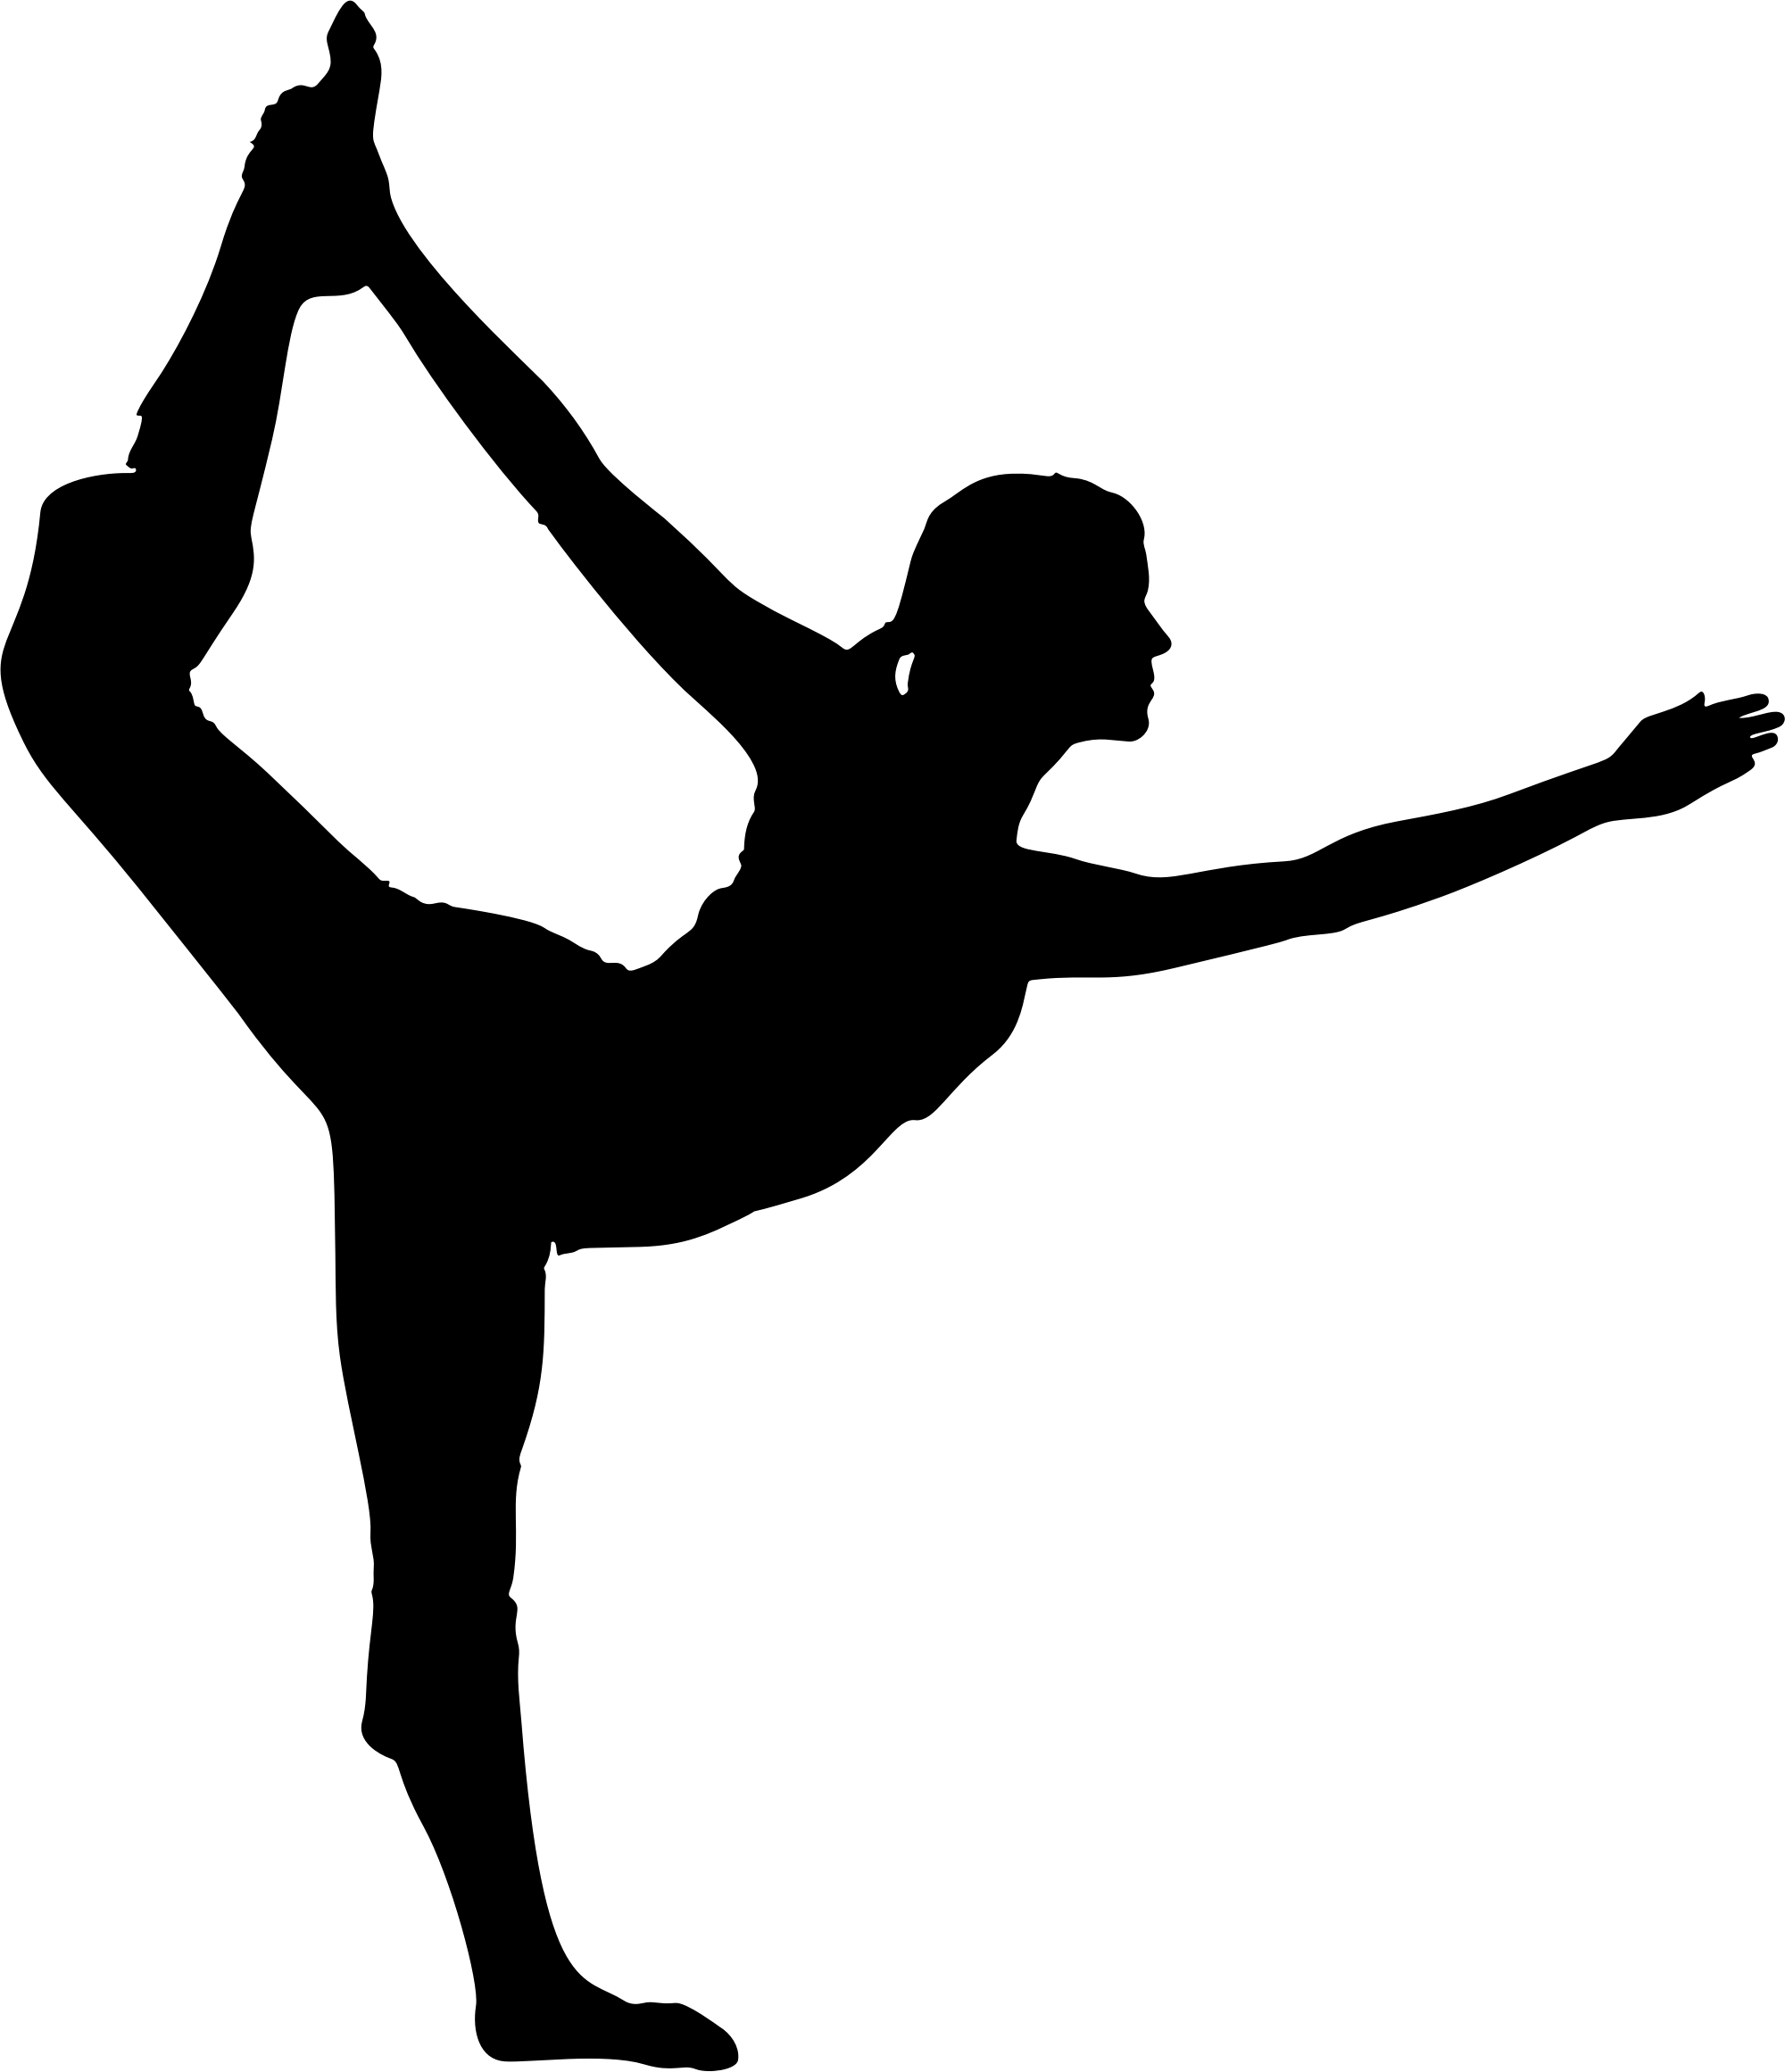 image transparent download Clipart